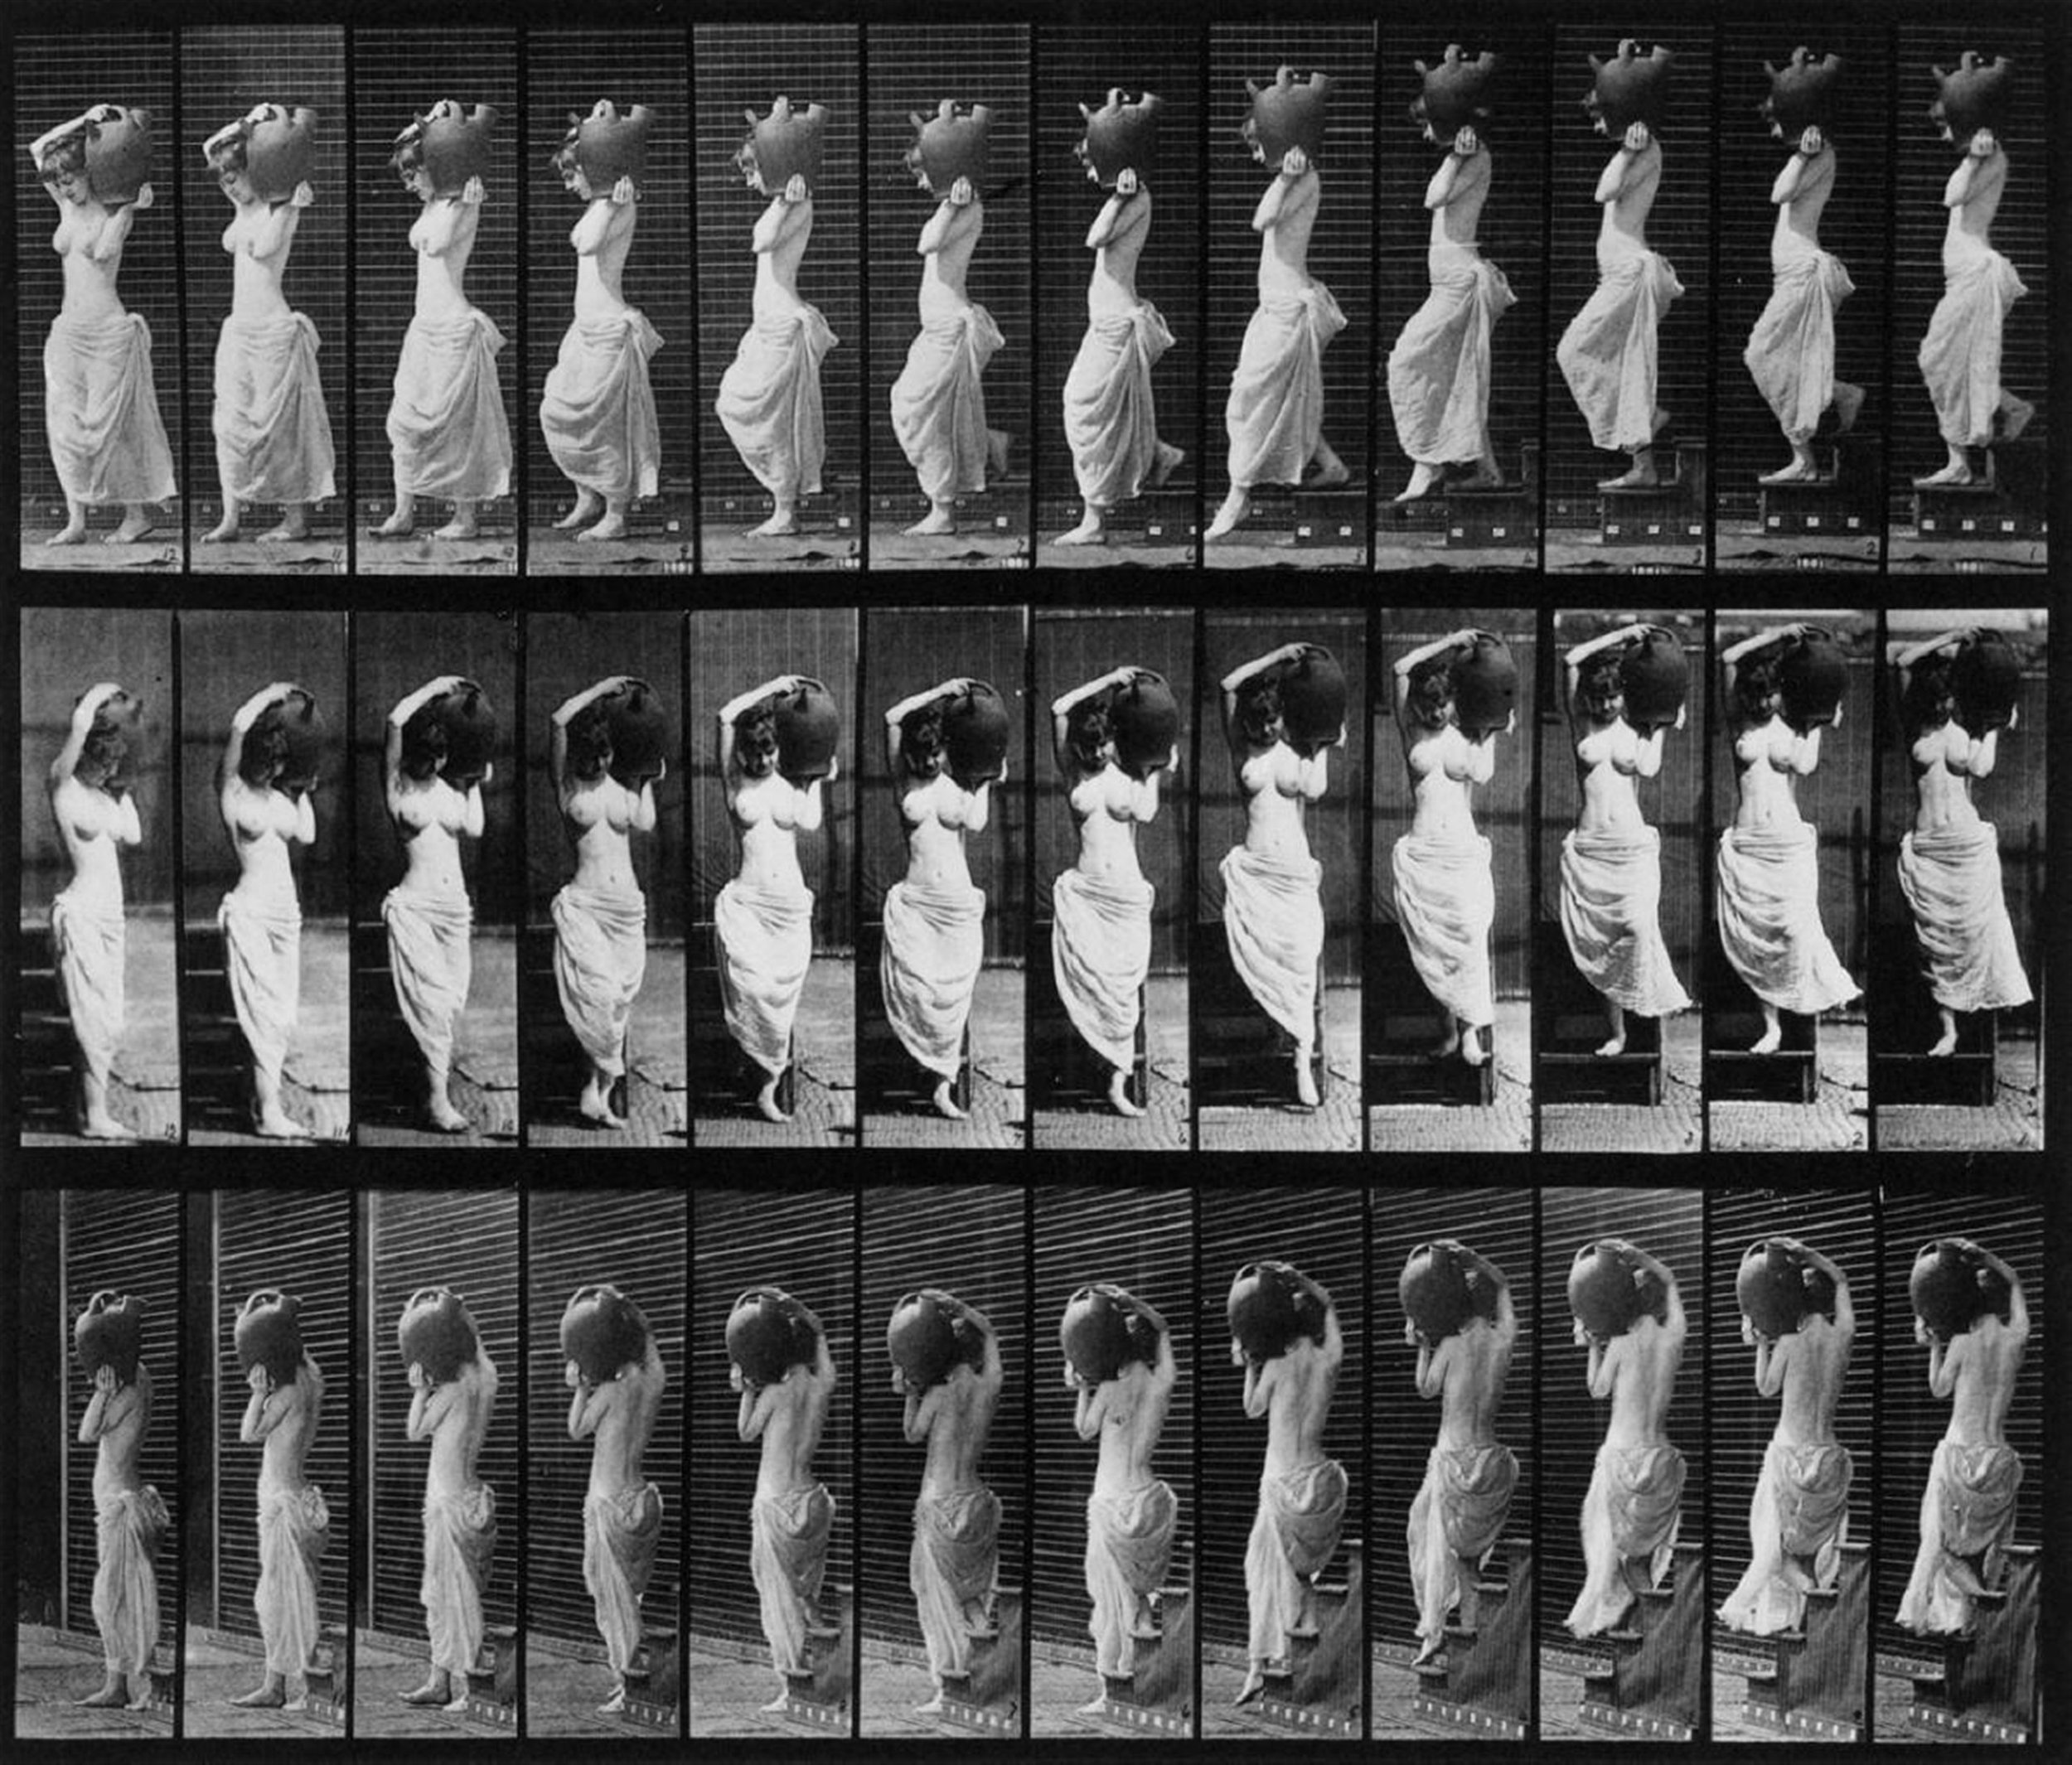 Muybridge Movement Study